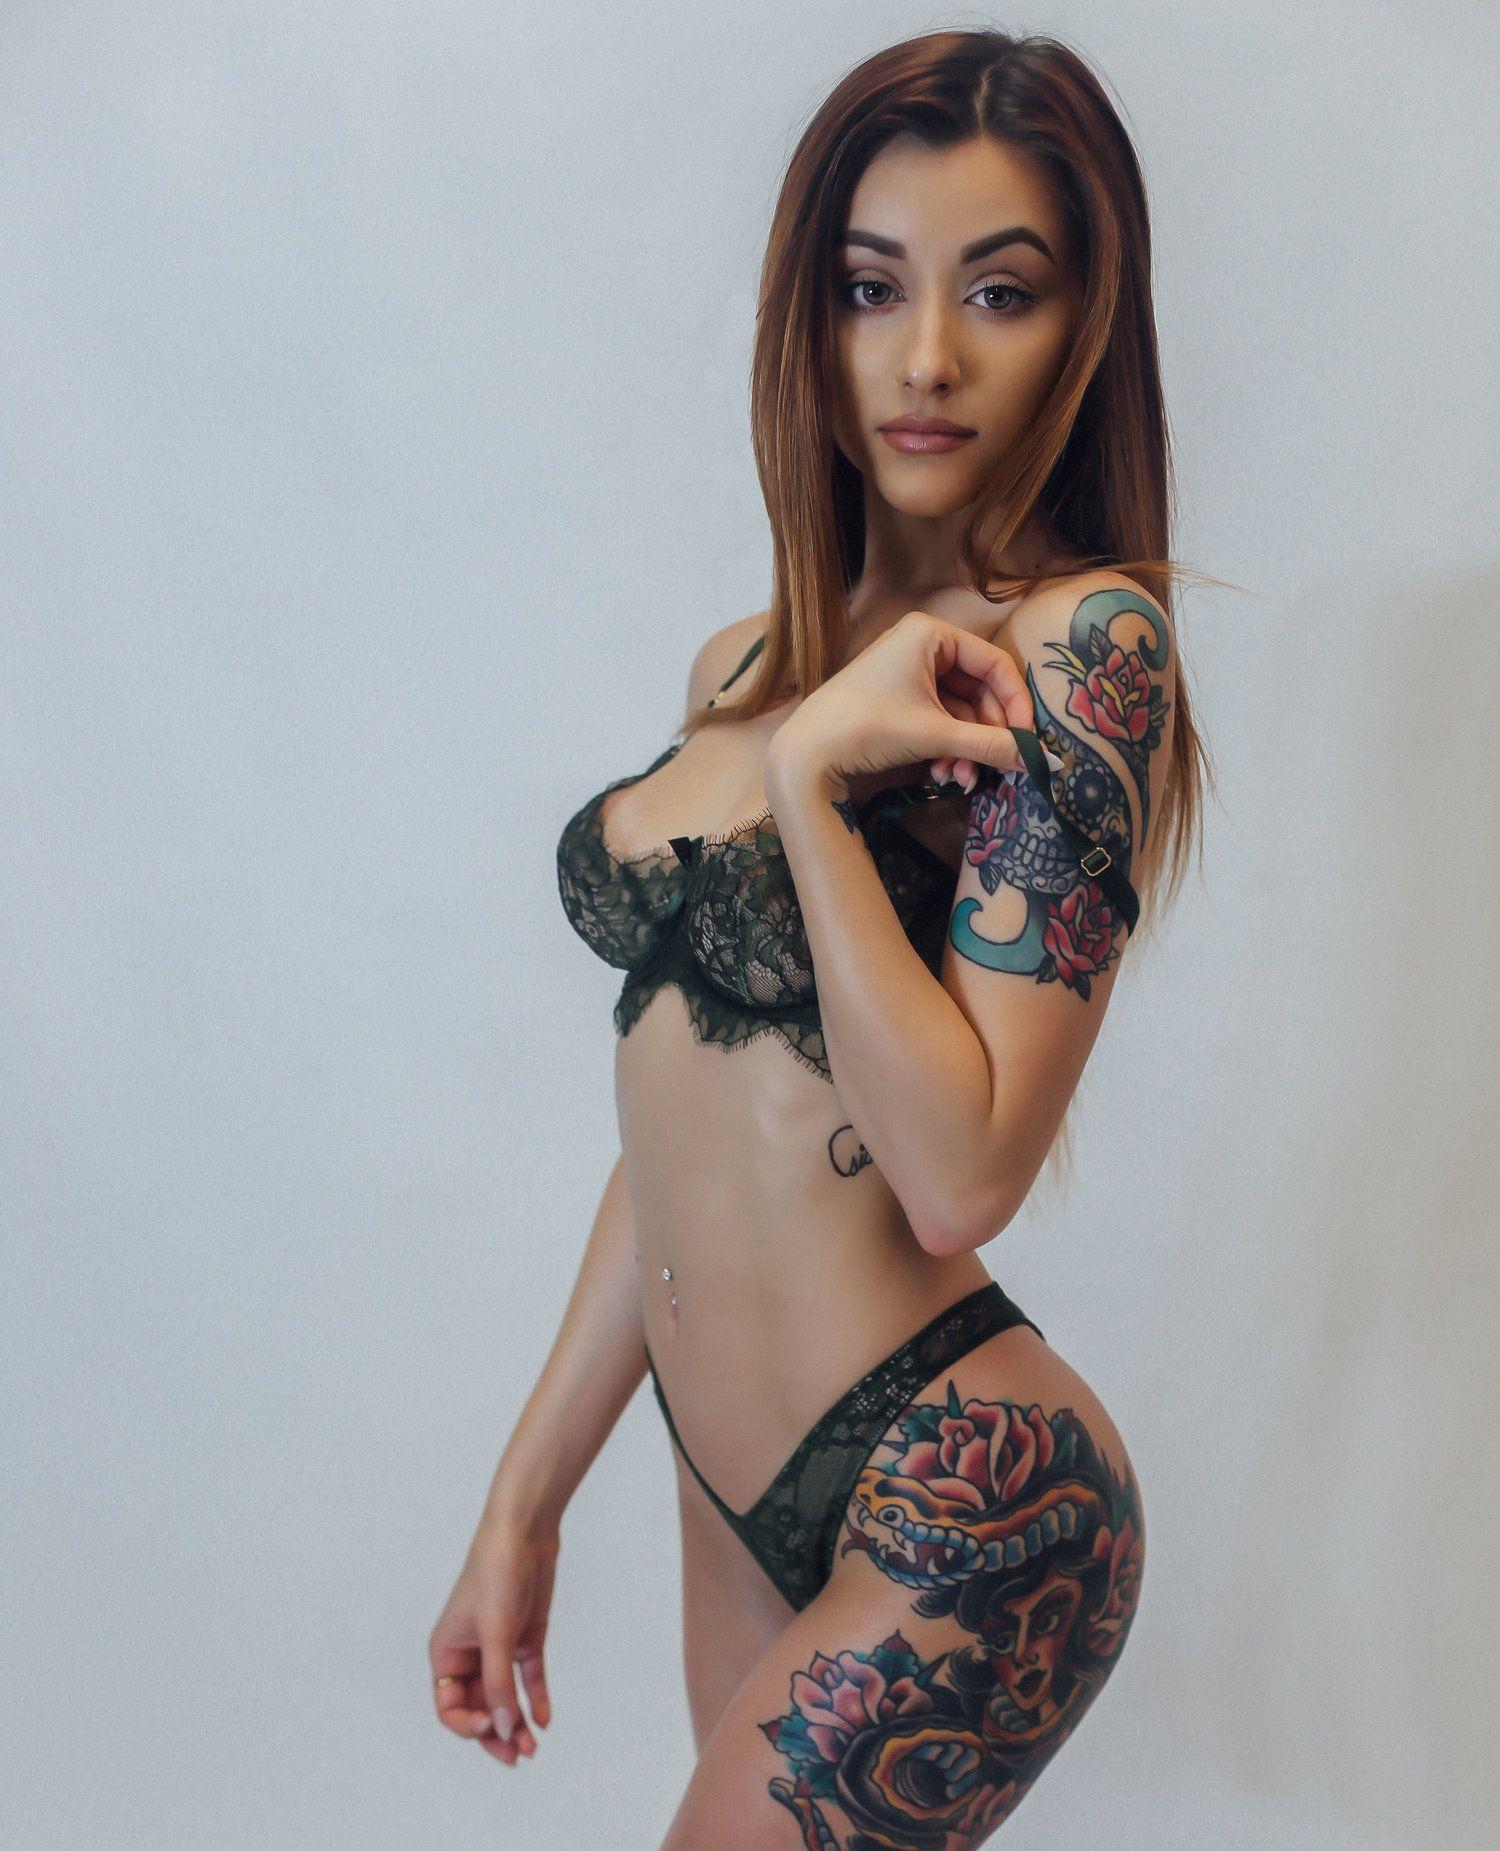 Tattoo girl dating